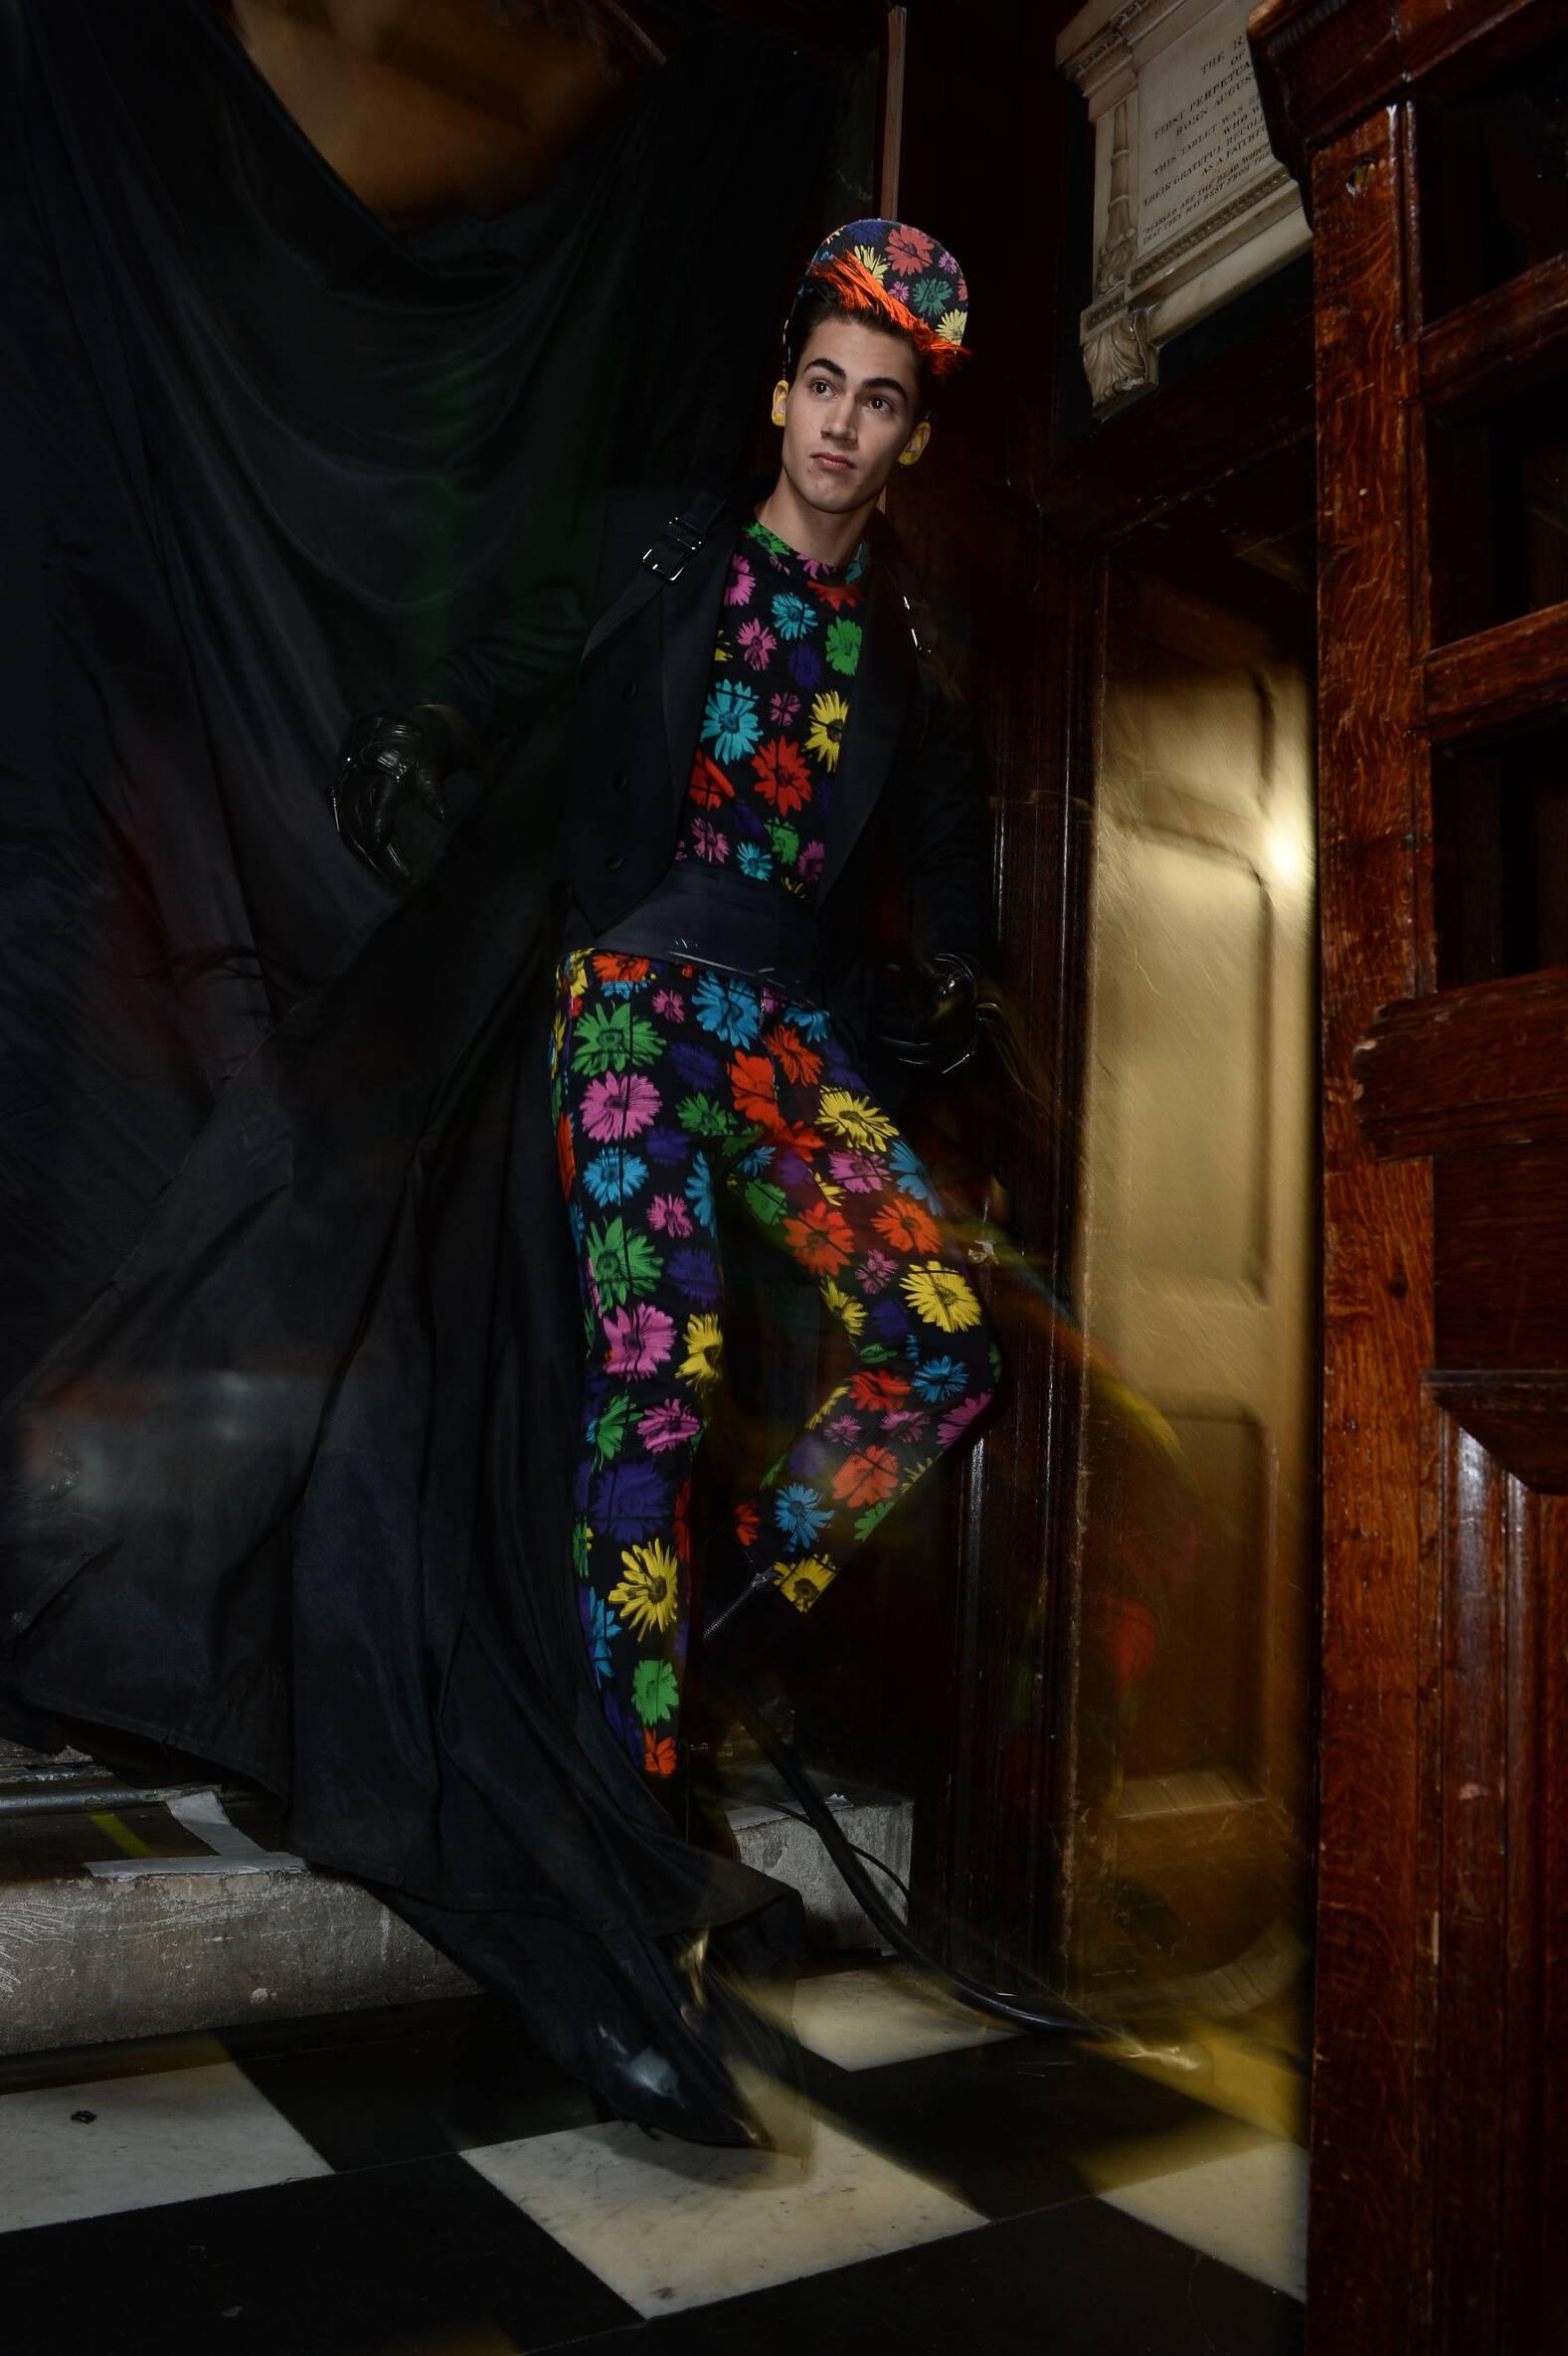 Backstage Moschino Fashion Show Model London